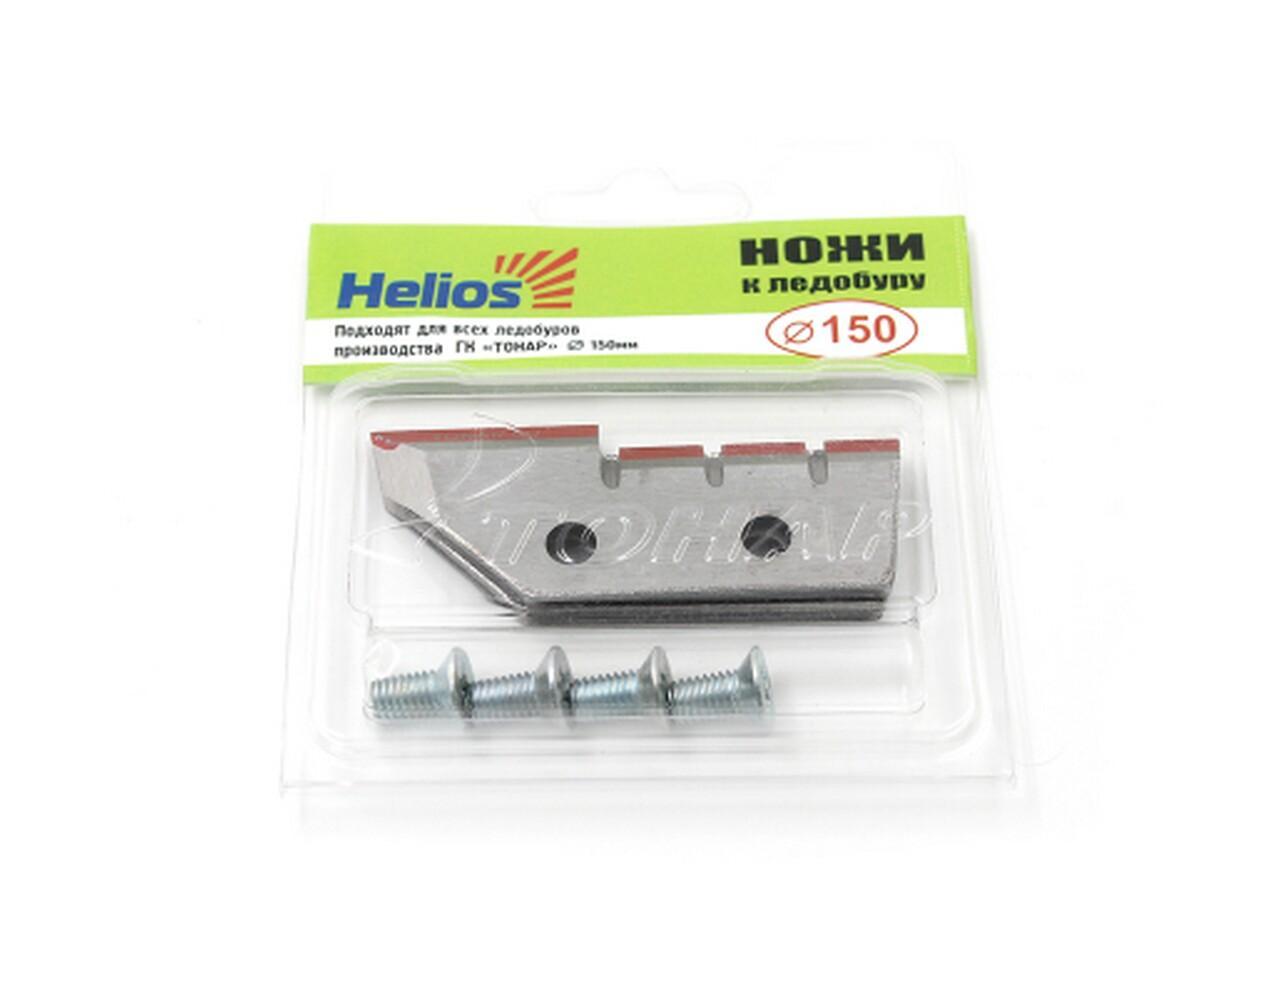 Ножи к ледобуру HELIOS 150(L) (ТОНАР)